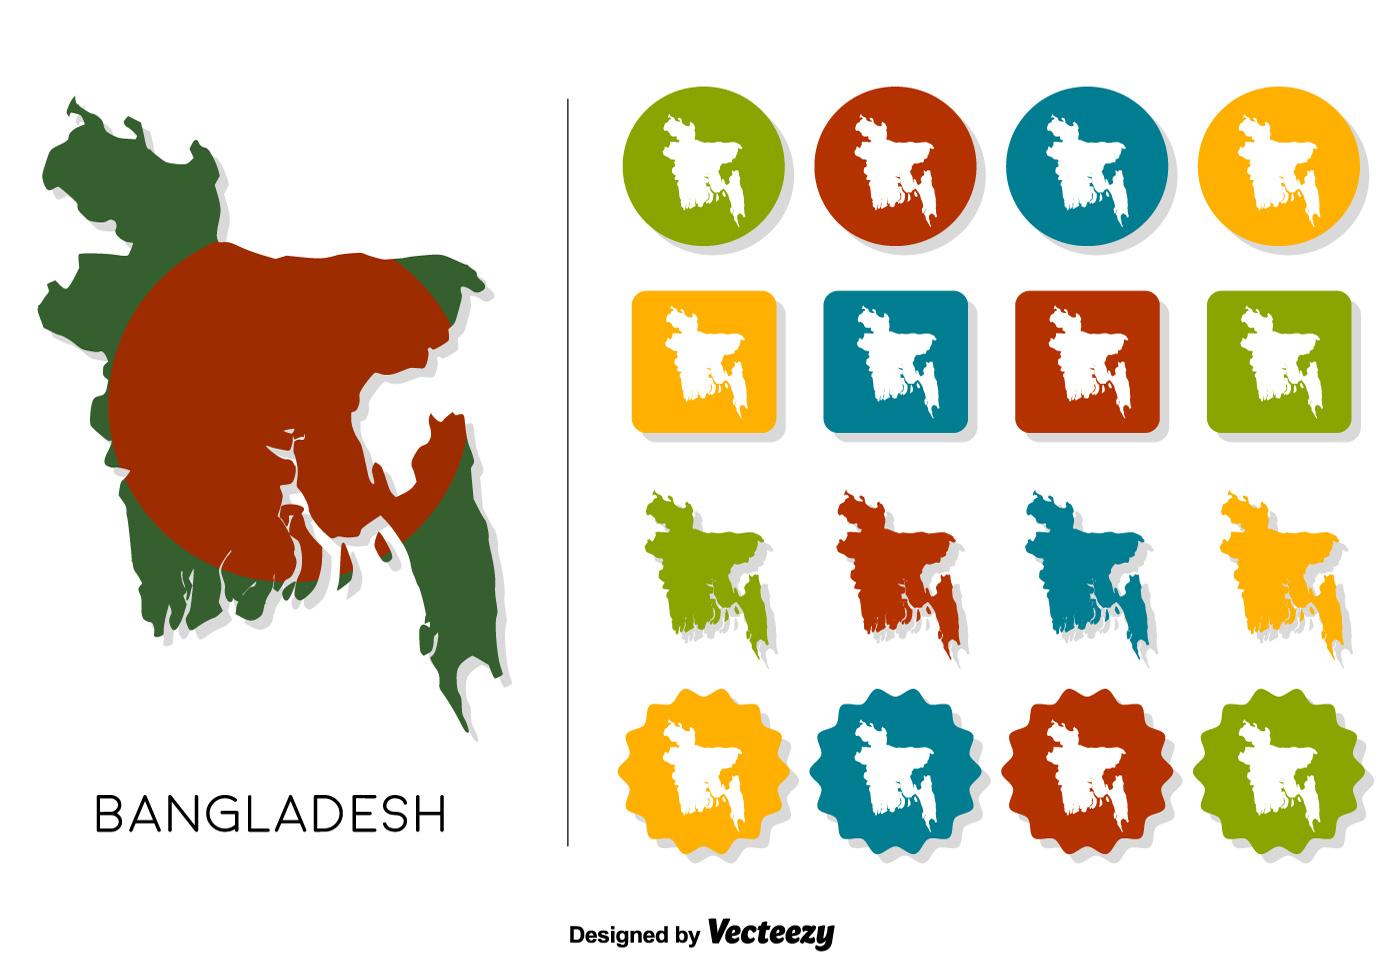 Free Maps And Flags Icons: Vector Bangladesh Map With Bangladesh Flag And Icons Set